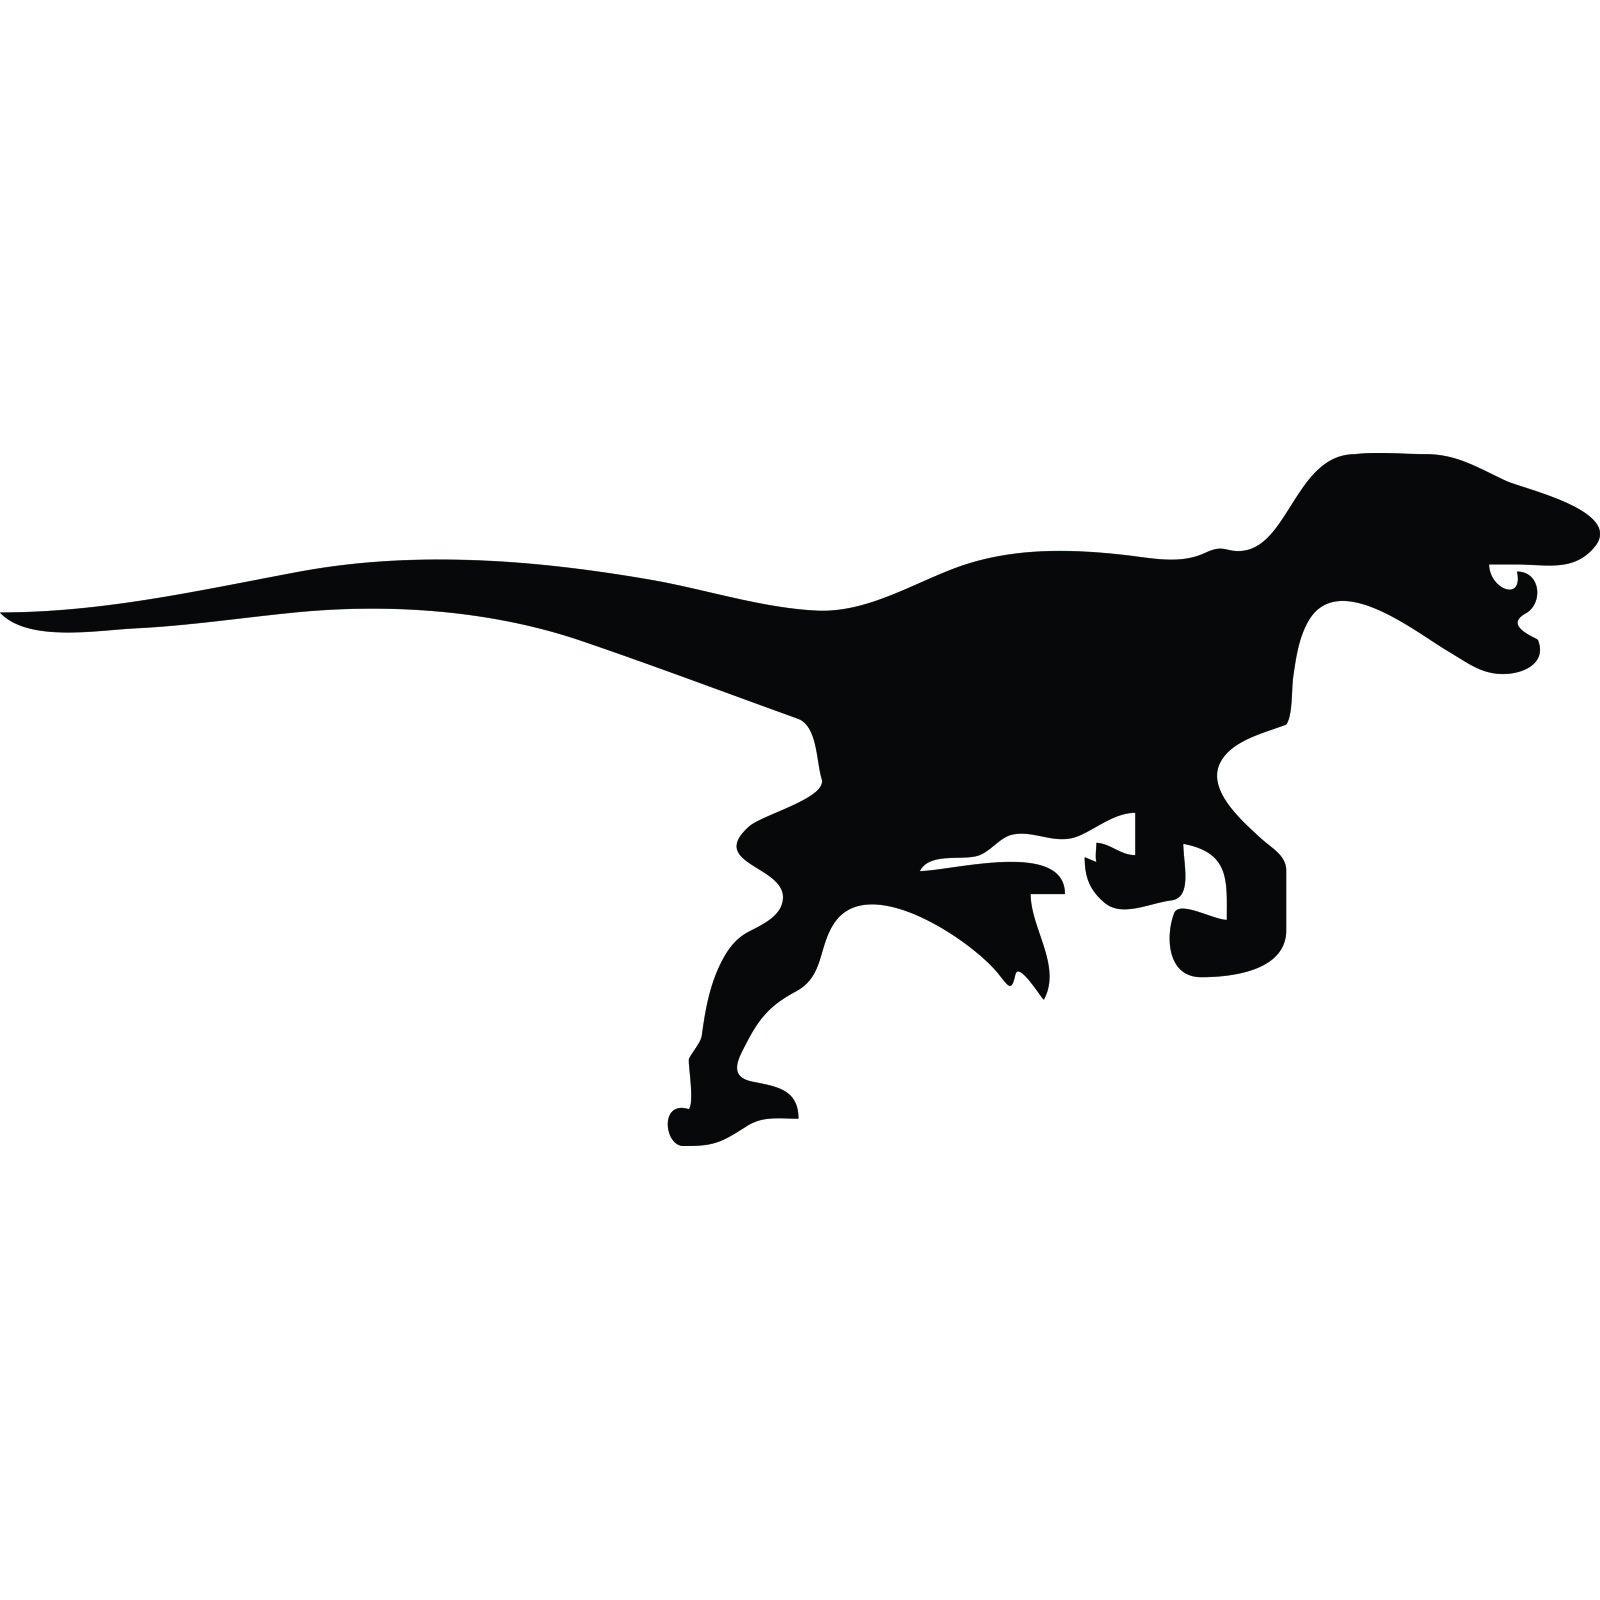 Velociraptor Dinosaur Silhouette Wall Sticker World of  : 11770 Size from www.world-of-wall-stickers.com size 1600 x 1600 jpeg 108kB